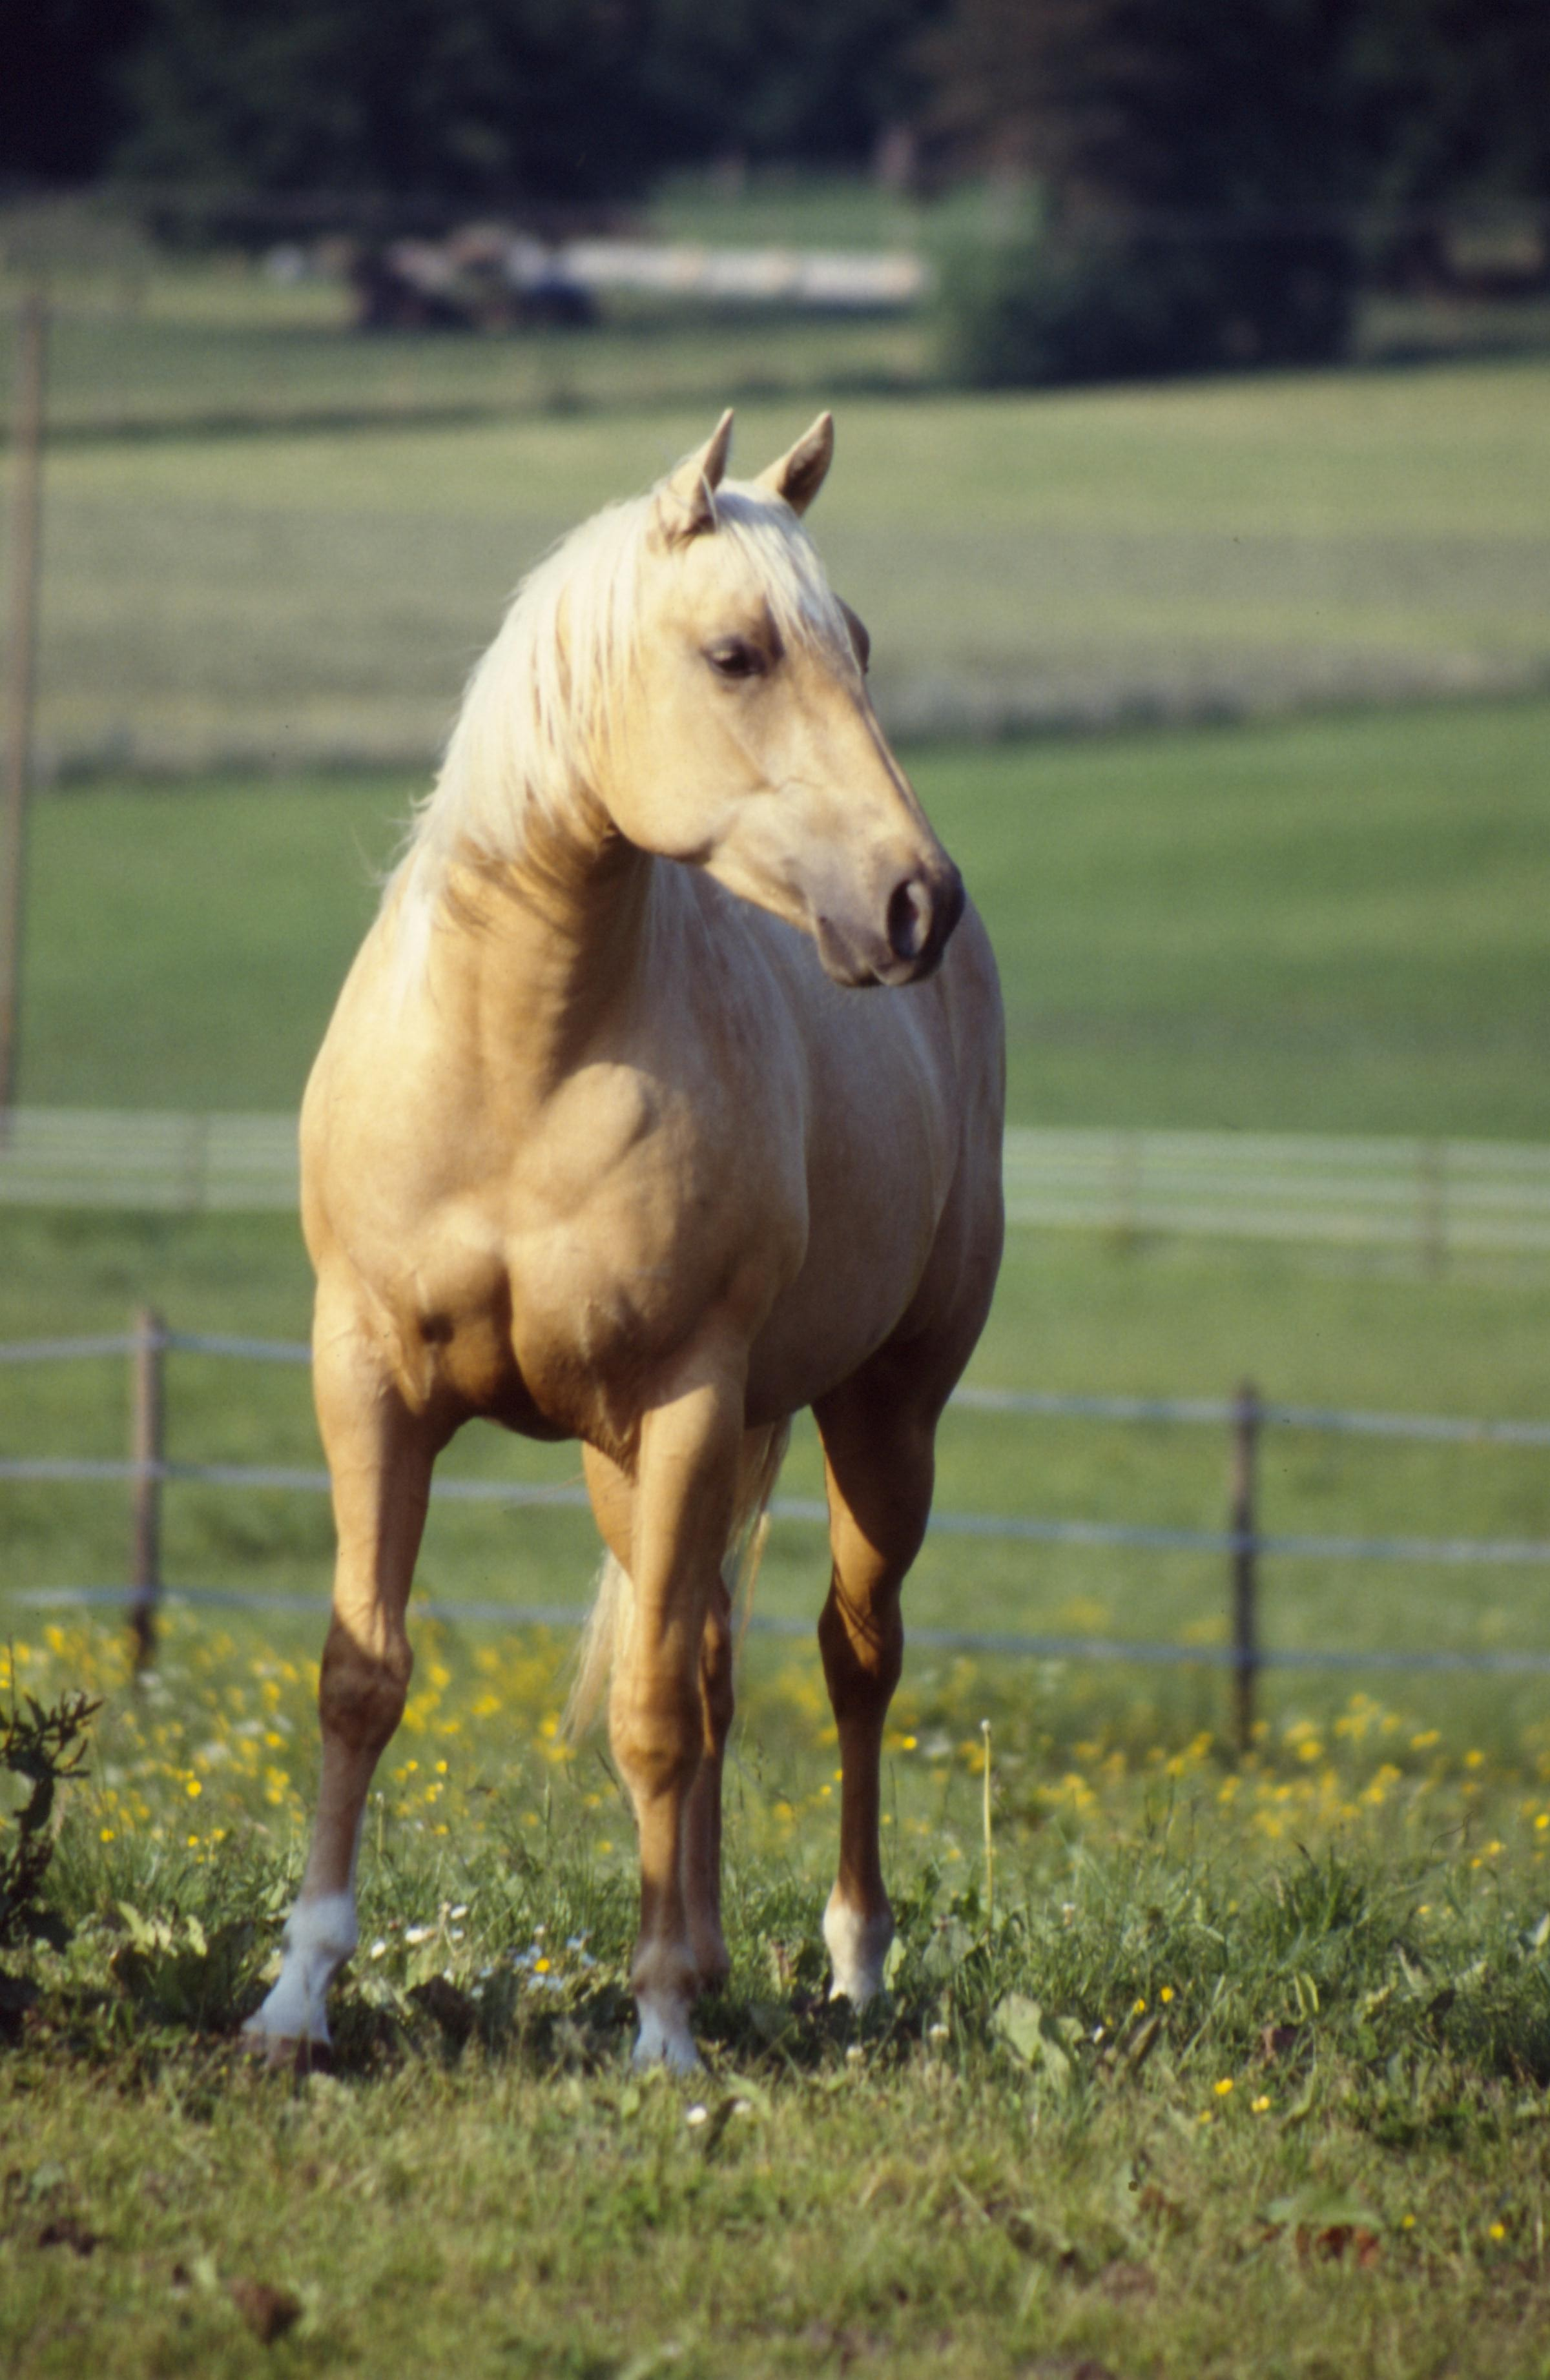 palomino foal - photo #15